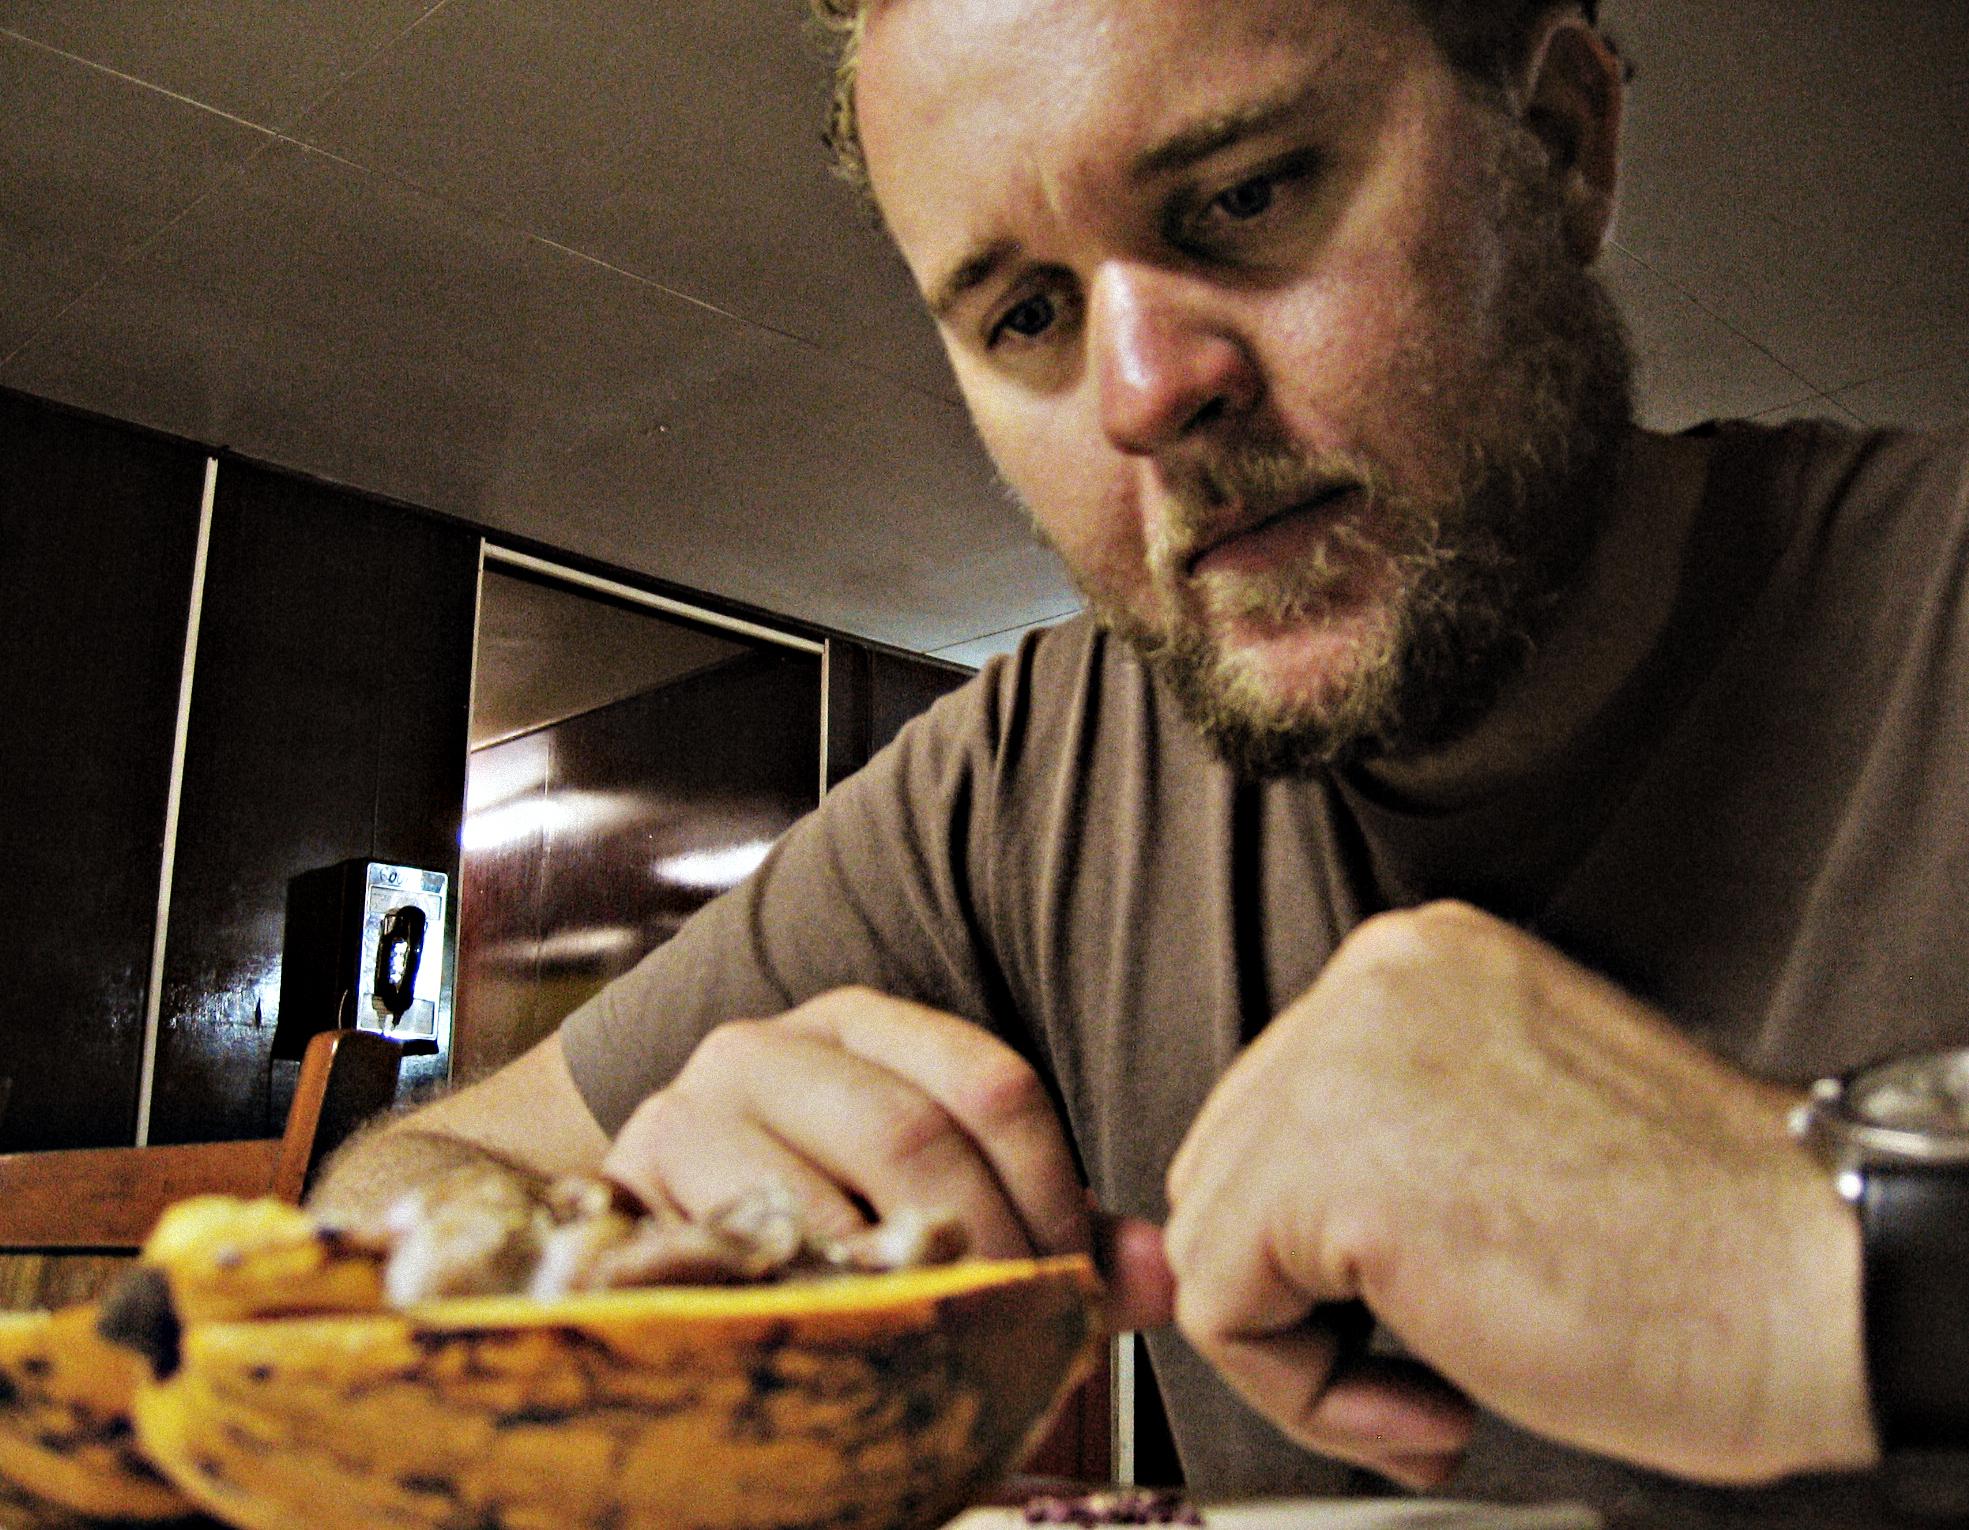 Luke Spencer, Chocolate-Maker-To-Be.. pondering the beans